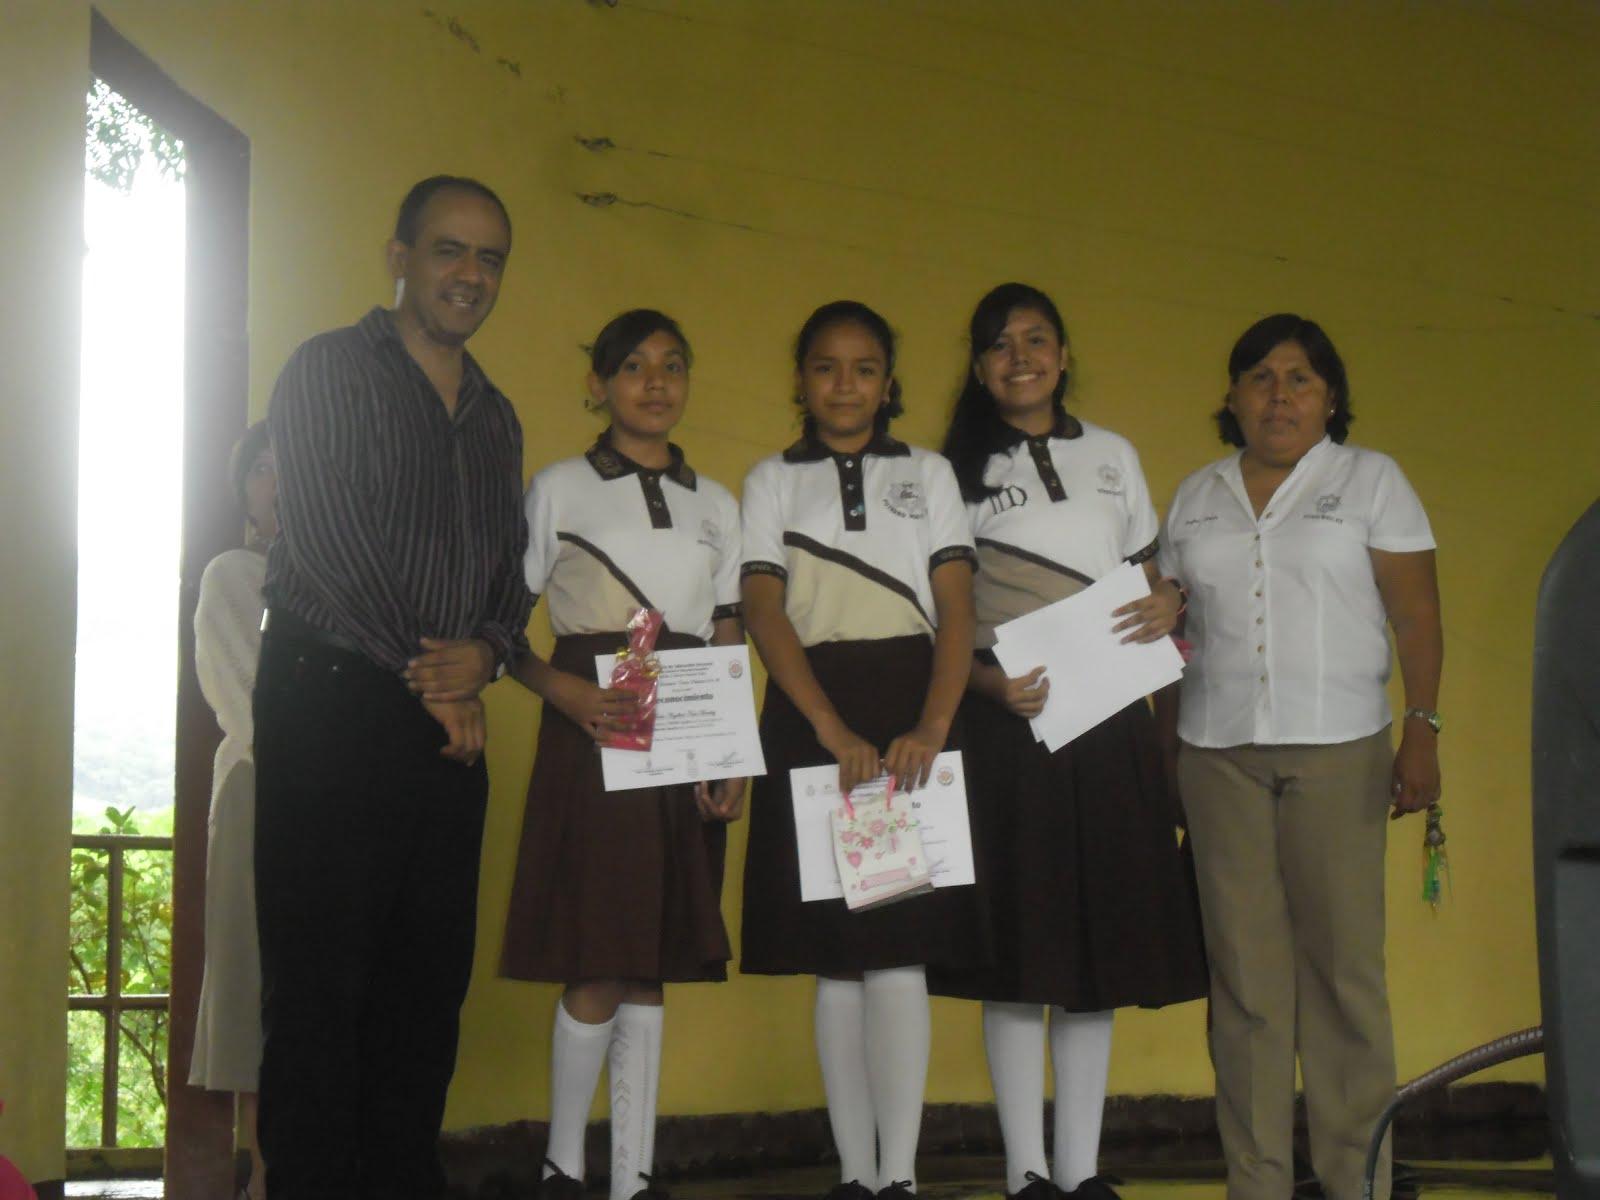 Concurso de Calaveras Literarias 2015